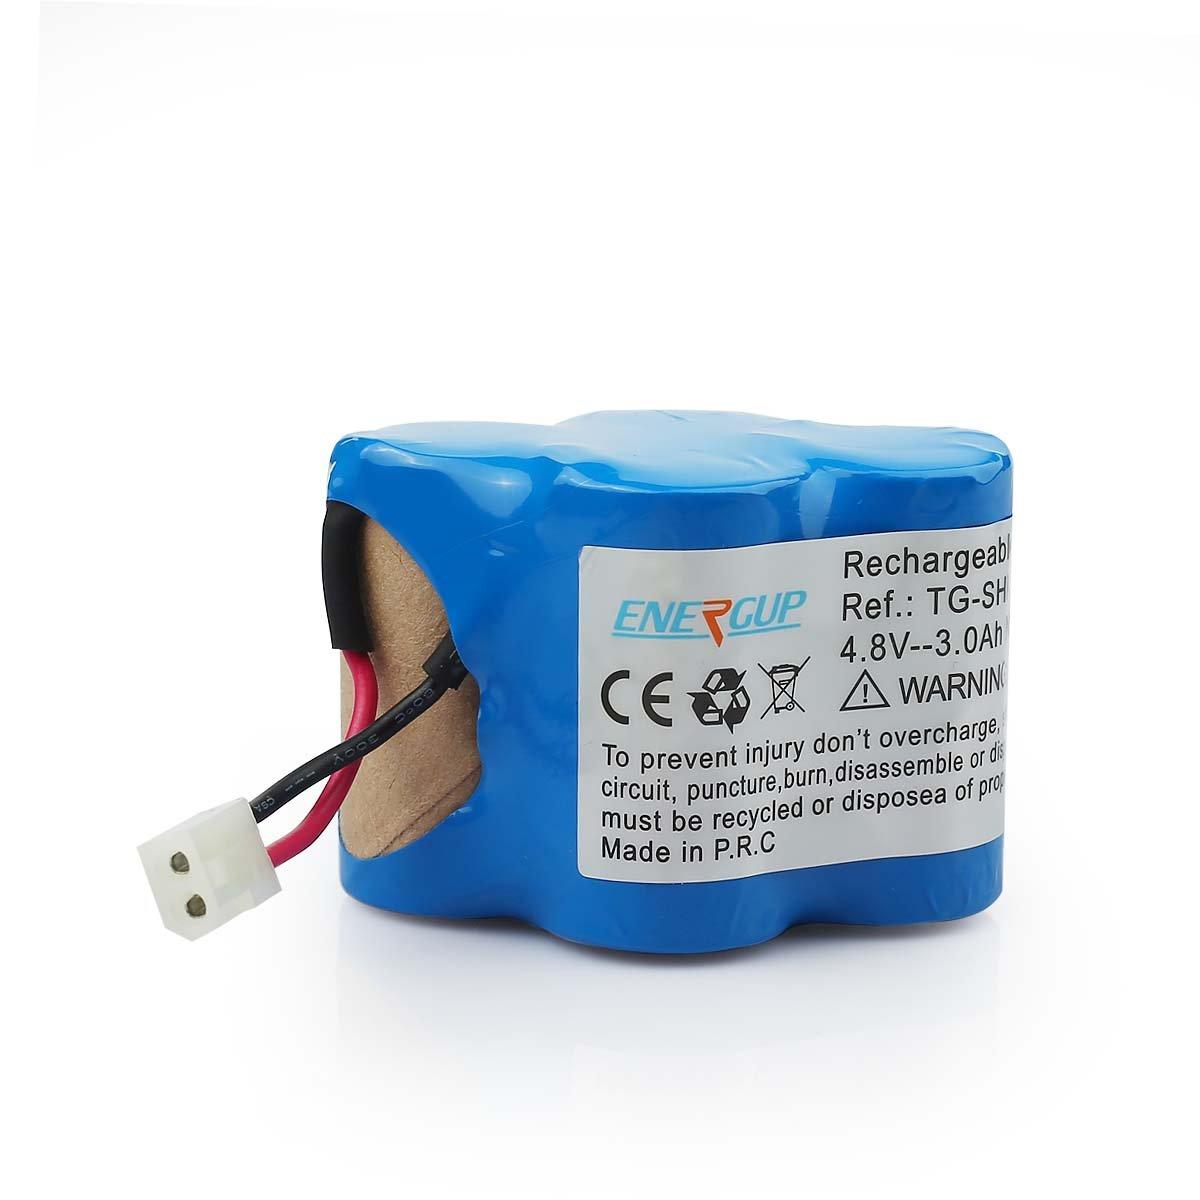 Energup Euro Pro Shark 4.8V Vacuum Replacment Battery for Shark V1700Z V1930 Replaces X1725QN